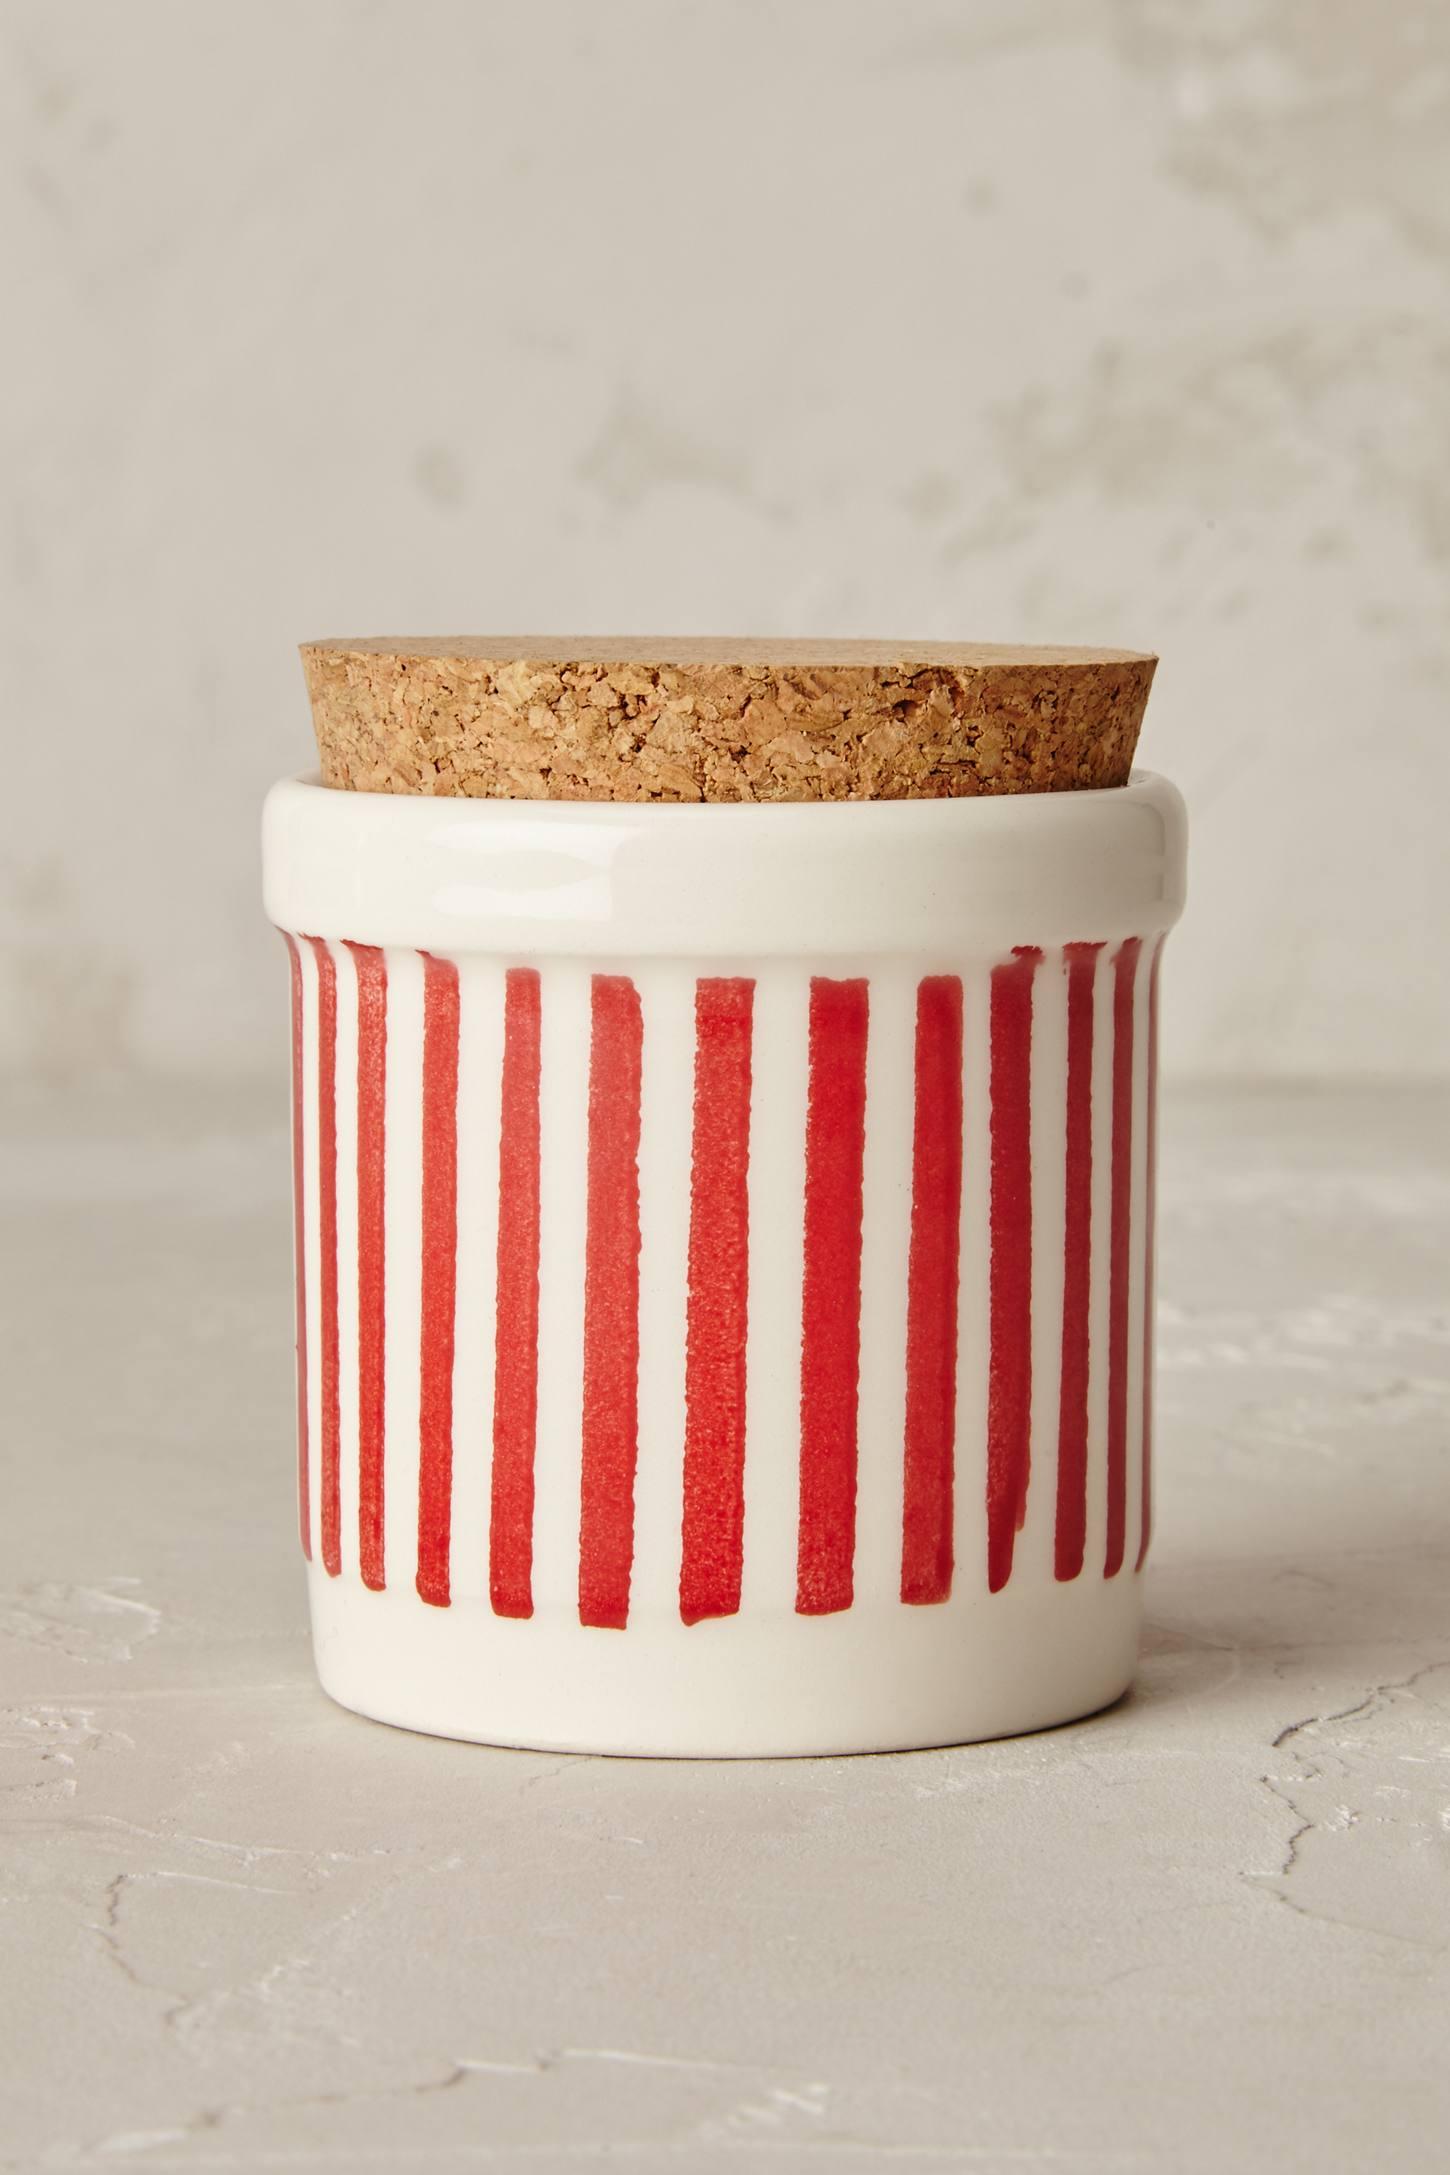 Painterly Spice Jar